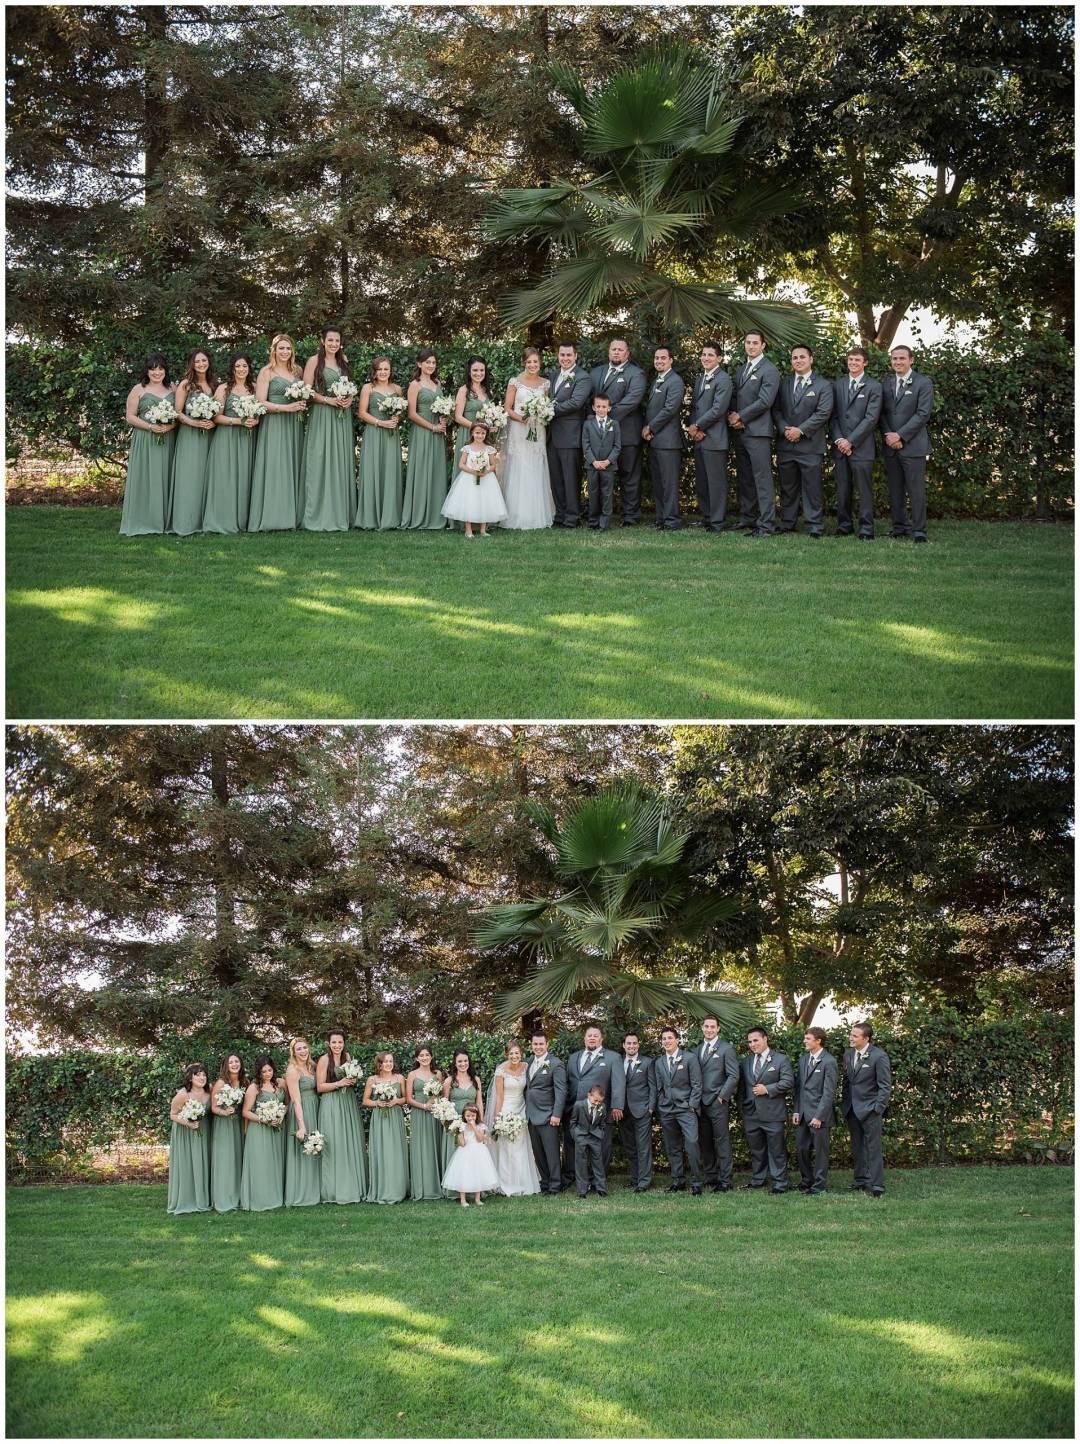 Kelcie & Devin Wedding Third Element Photography & Cinema Koetsier Ranch Visalia Tulare Fresno Hybrid Film Wedding Photographer_0014